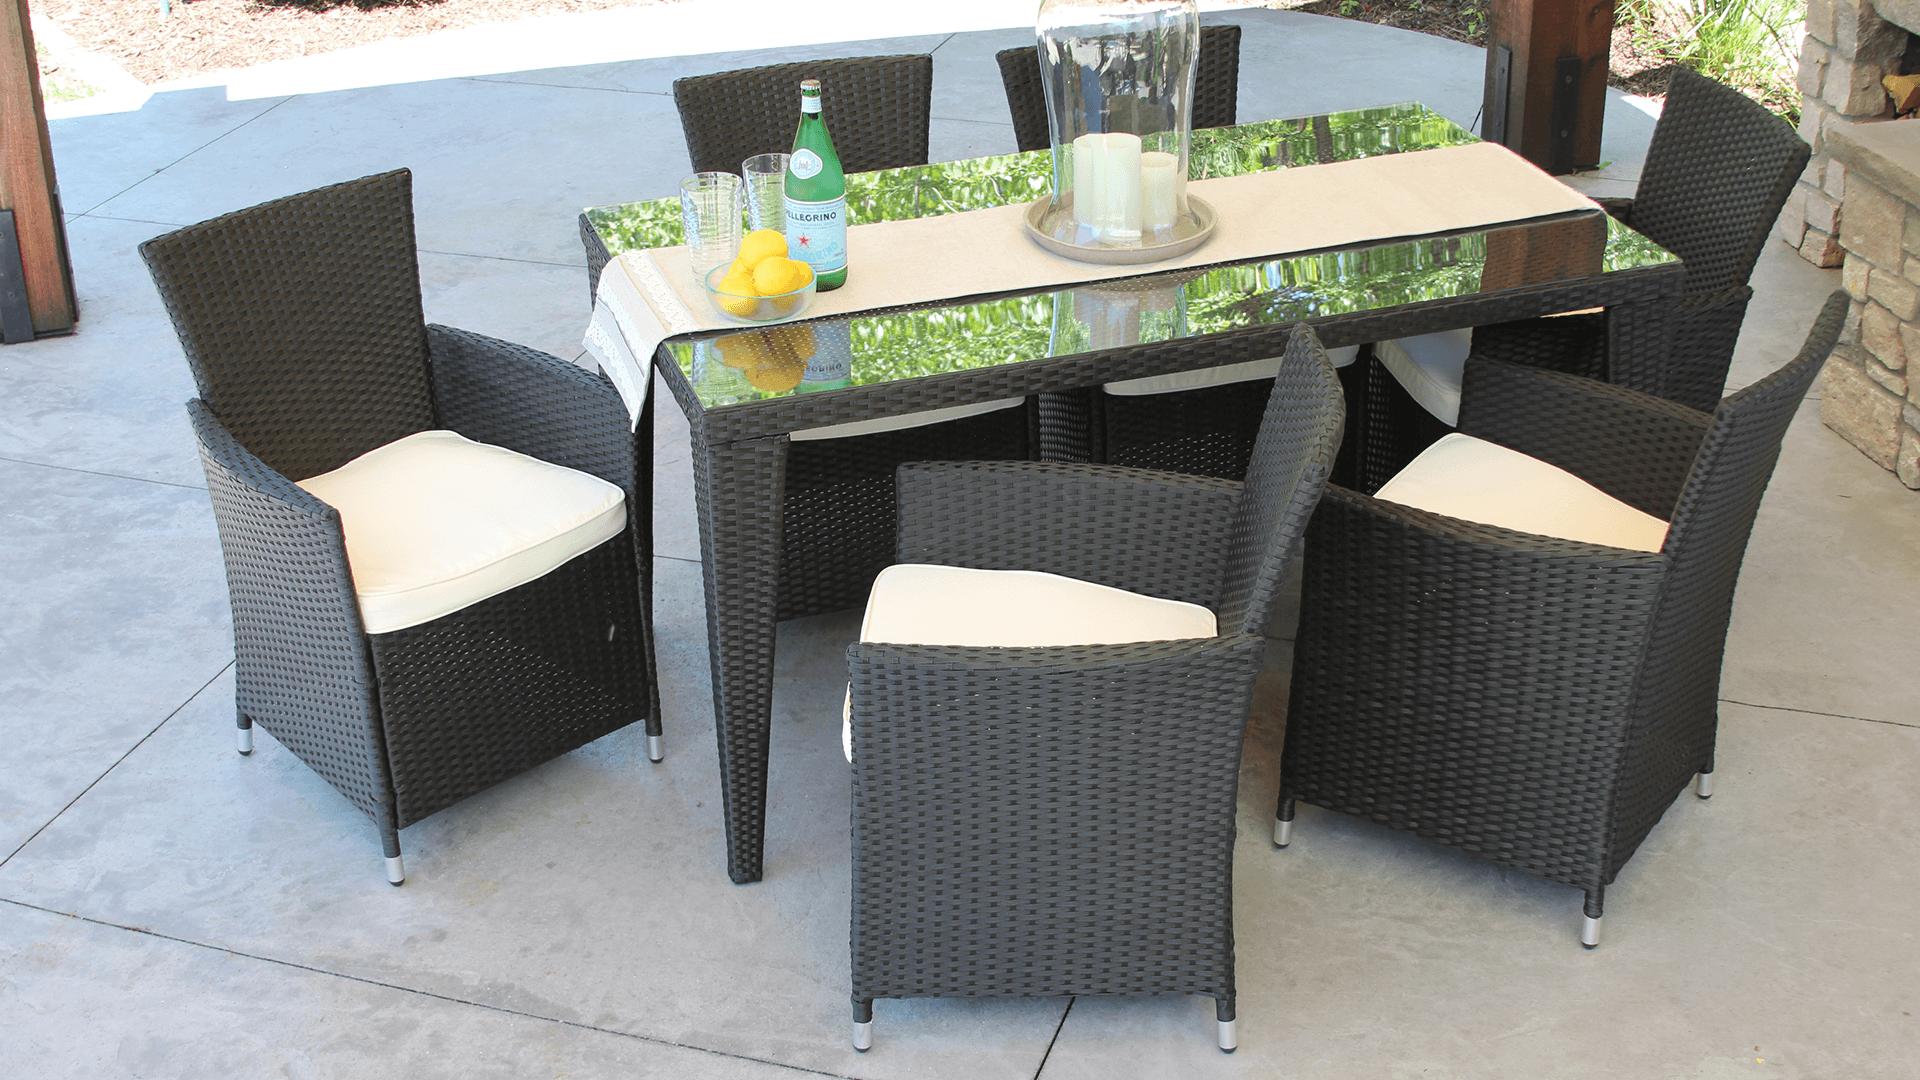 7 Piece Wicker Outdoor Dining Set